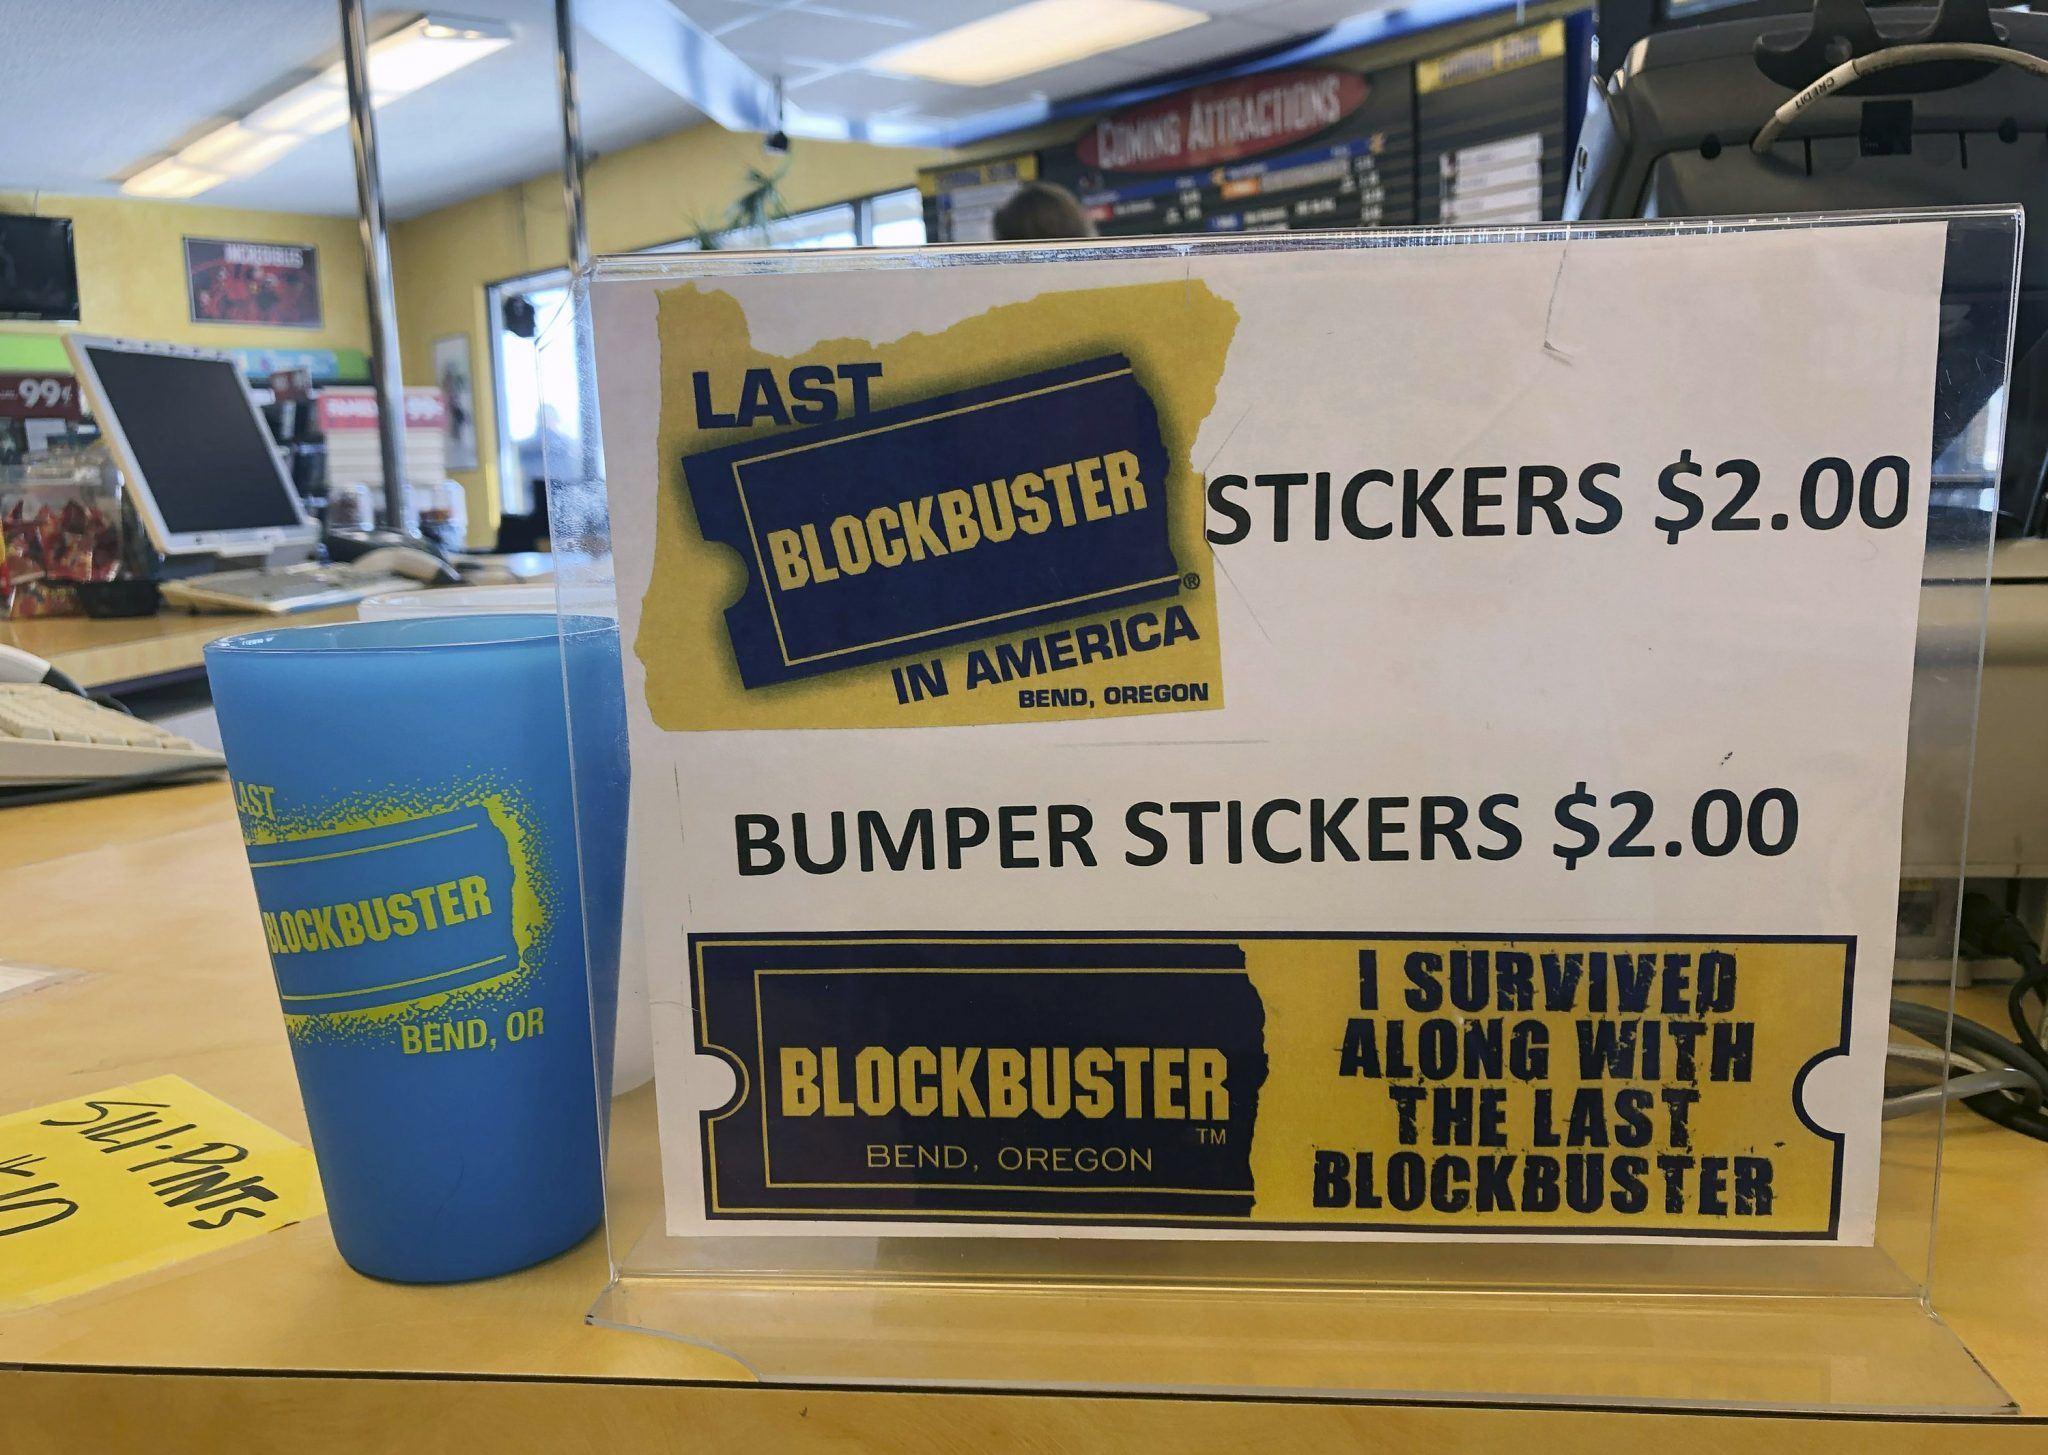 Bumper stickers for the Last Blockbuster on earth in Oregon.